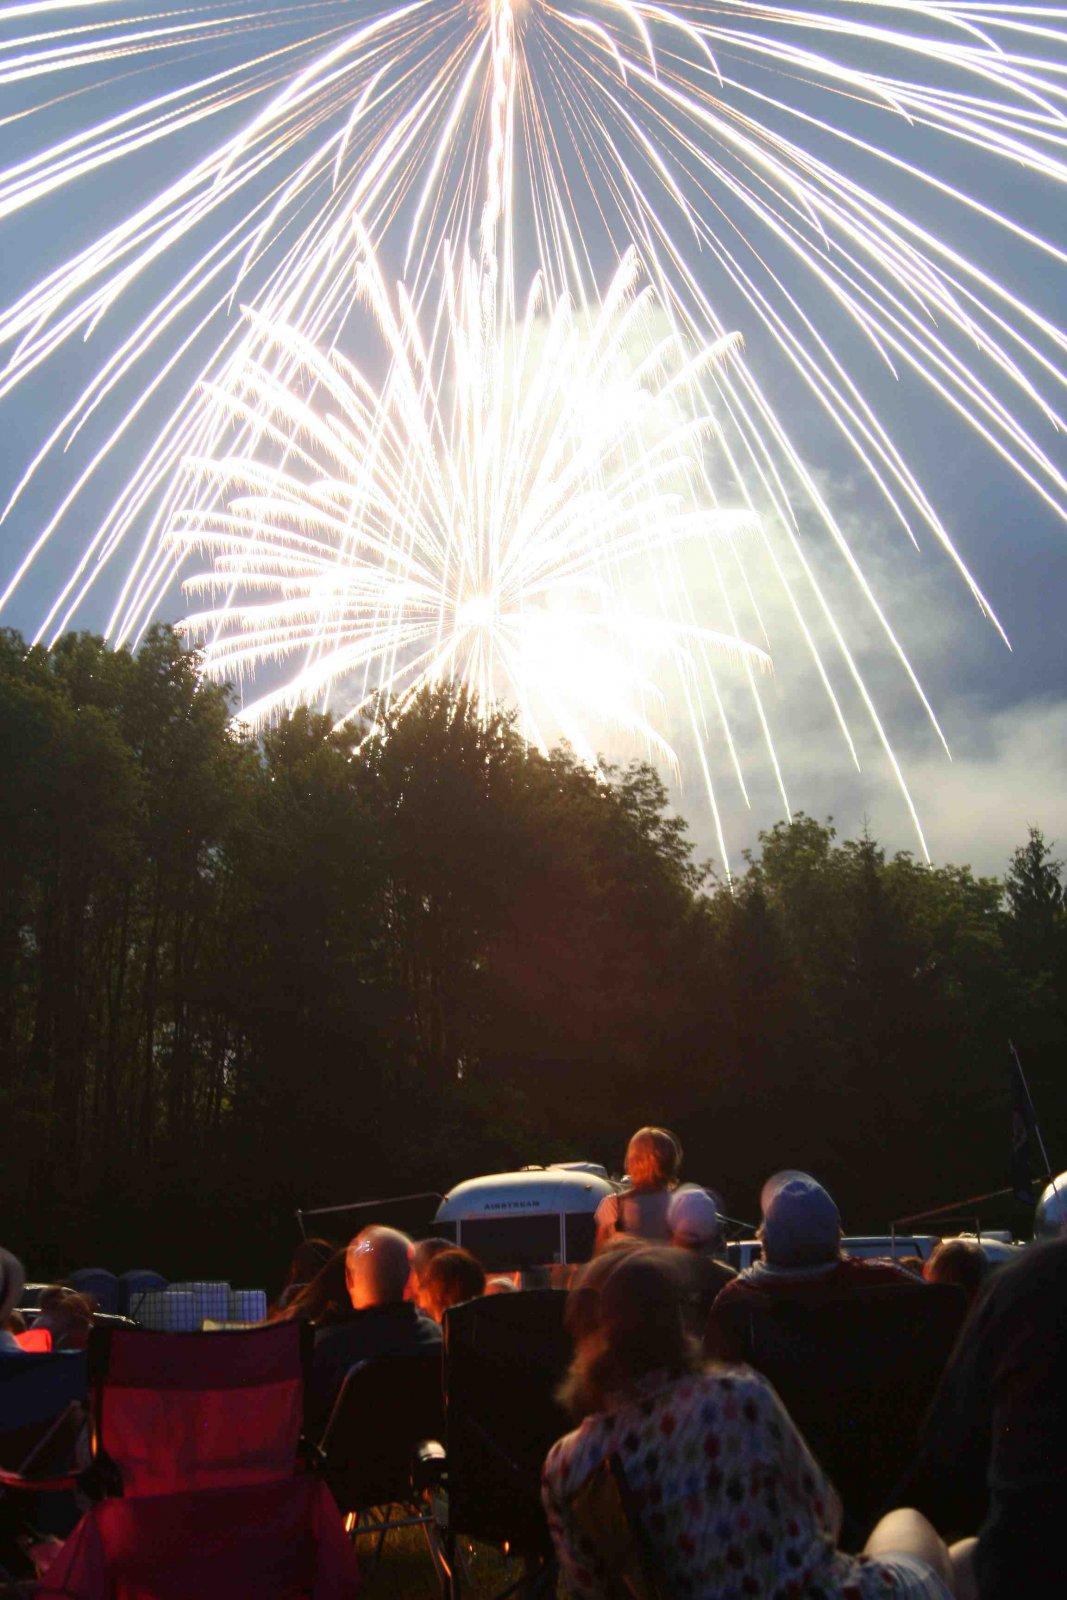 Click image for larger version  Name:bash fireworks2.jpg Views:51 Size:247.5 KB ID:105763